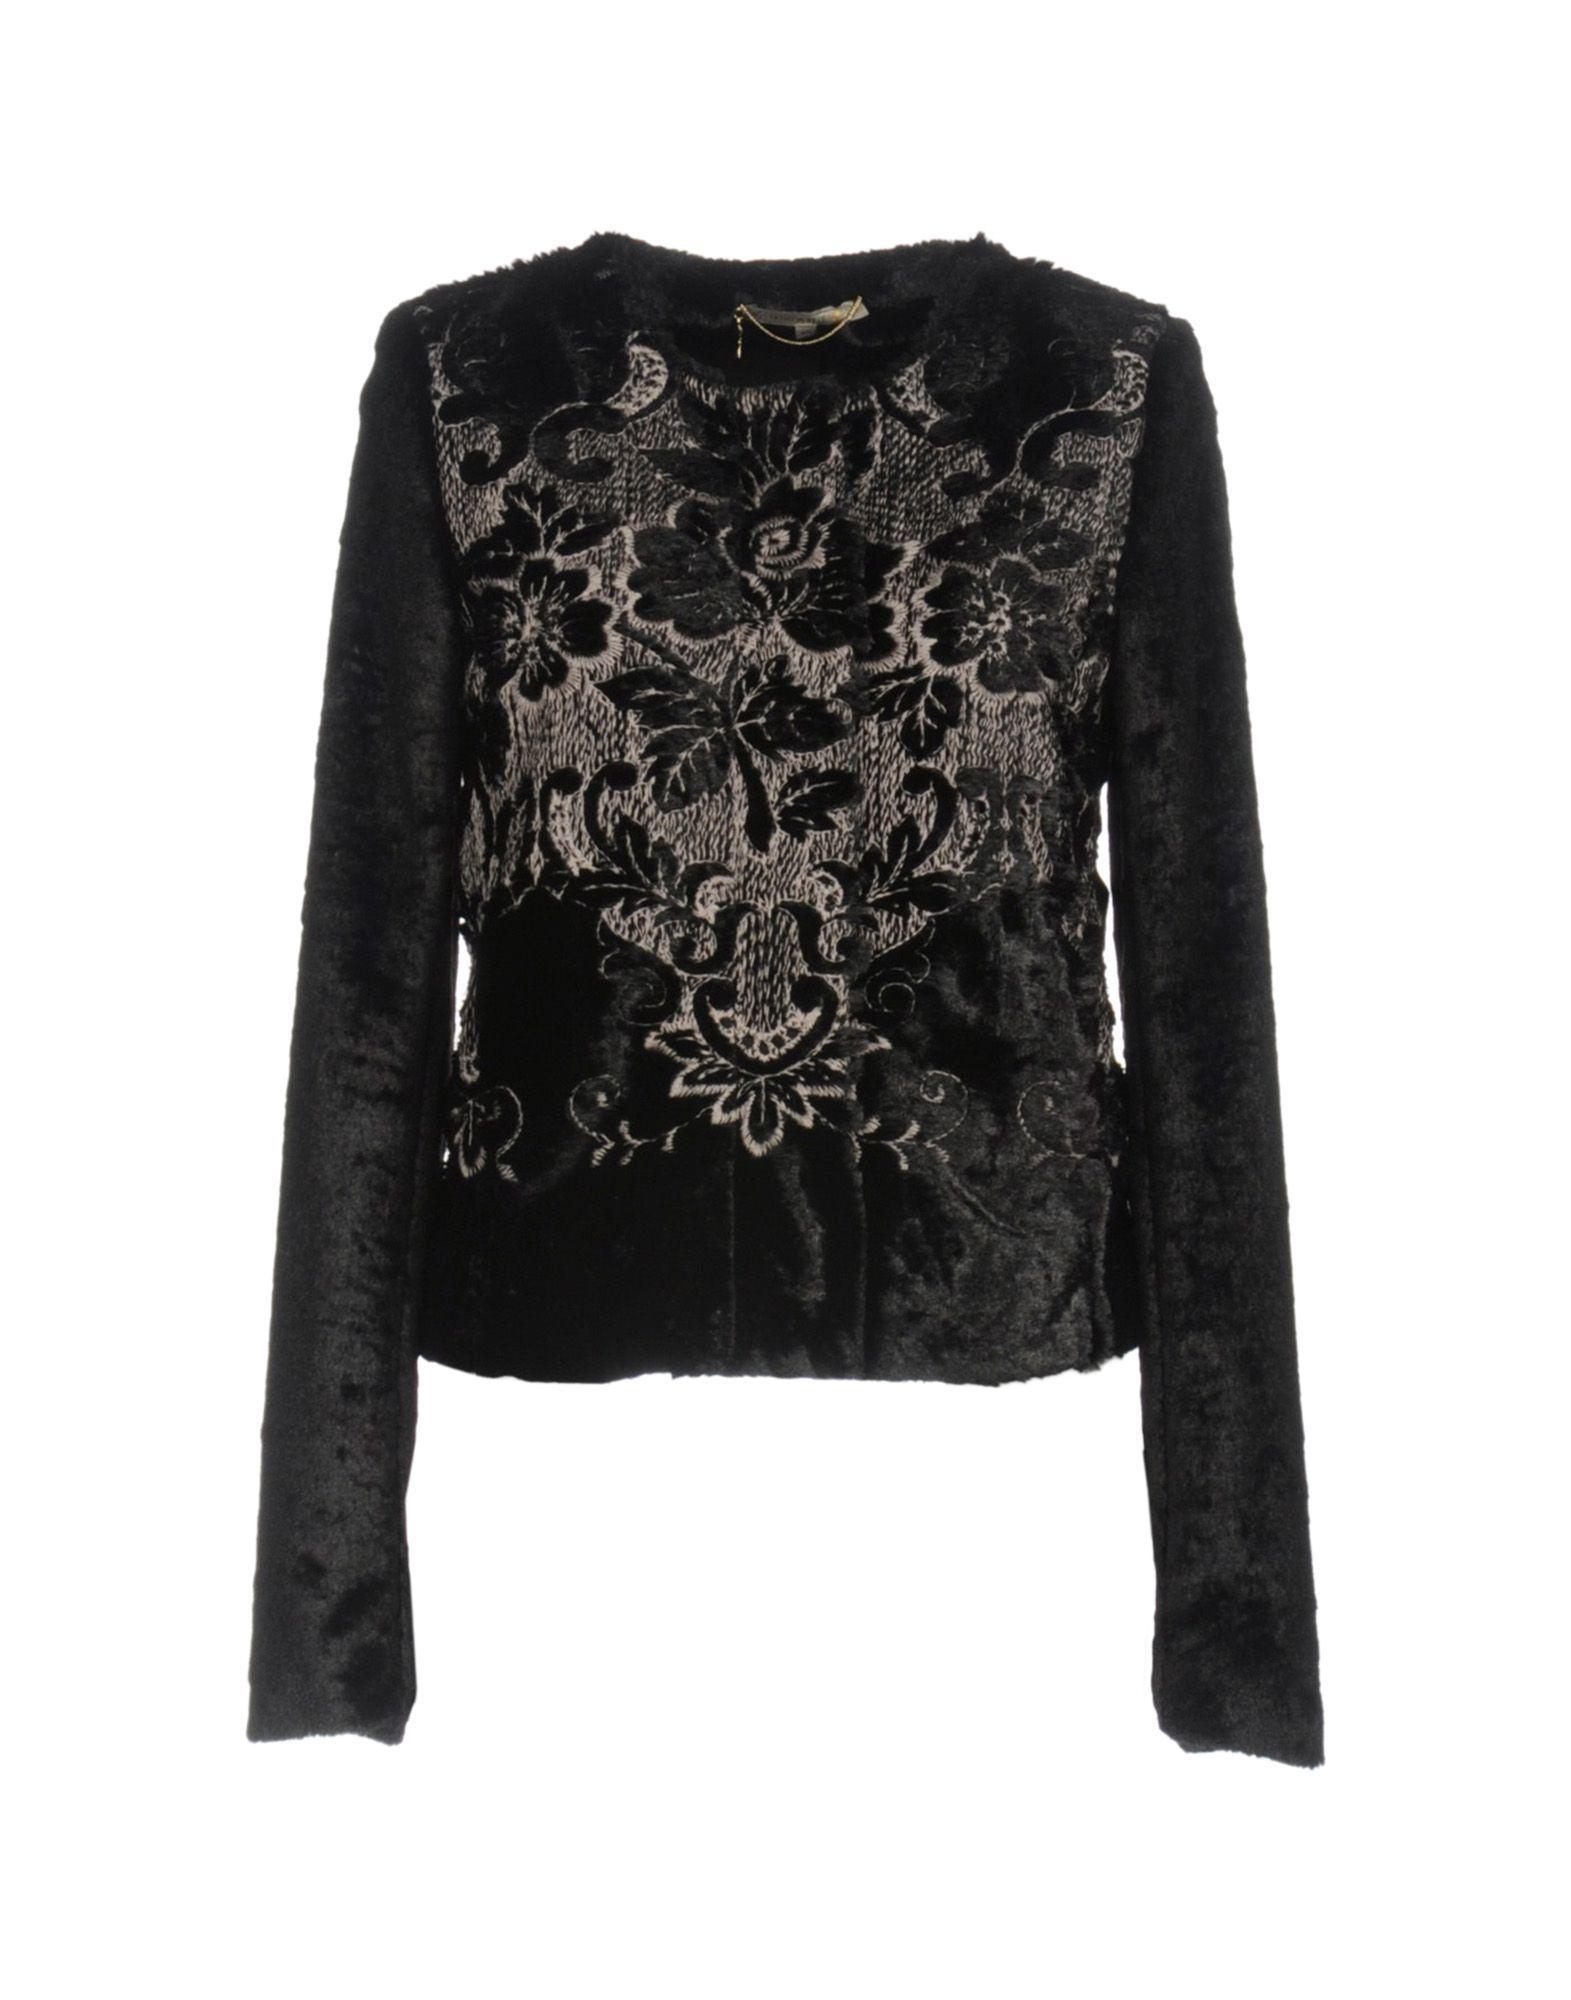 Patrizia Pepe Black Jacquard And Faux Fur Jacket